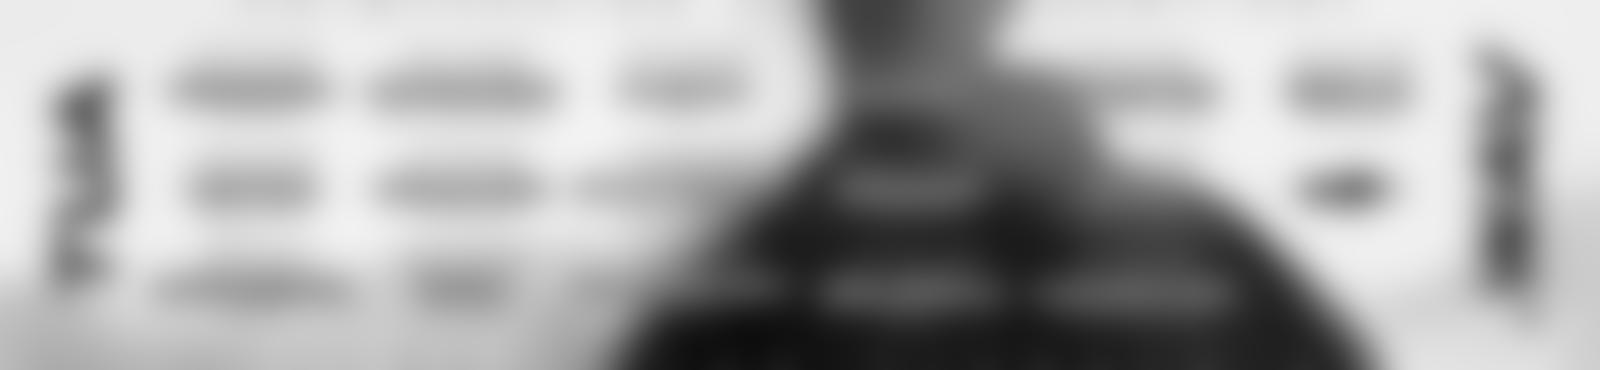 Blurred 55c0b2b2 9893 4581 a053 44af882297e7